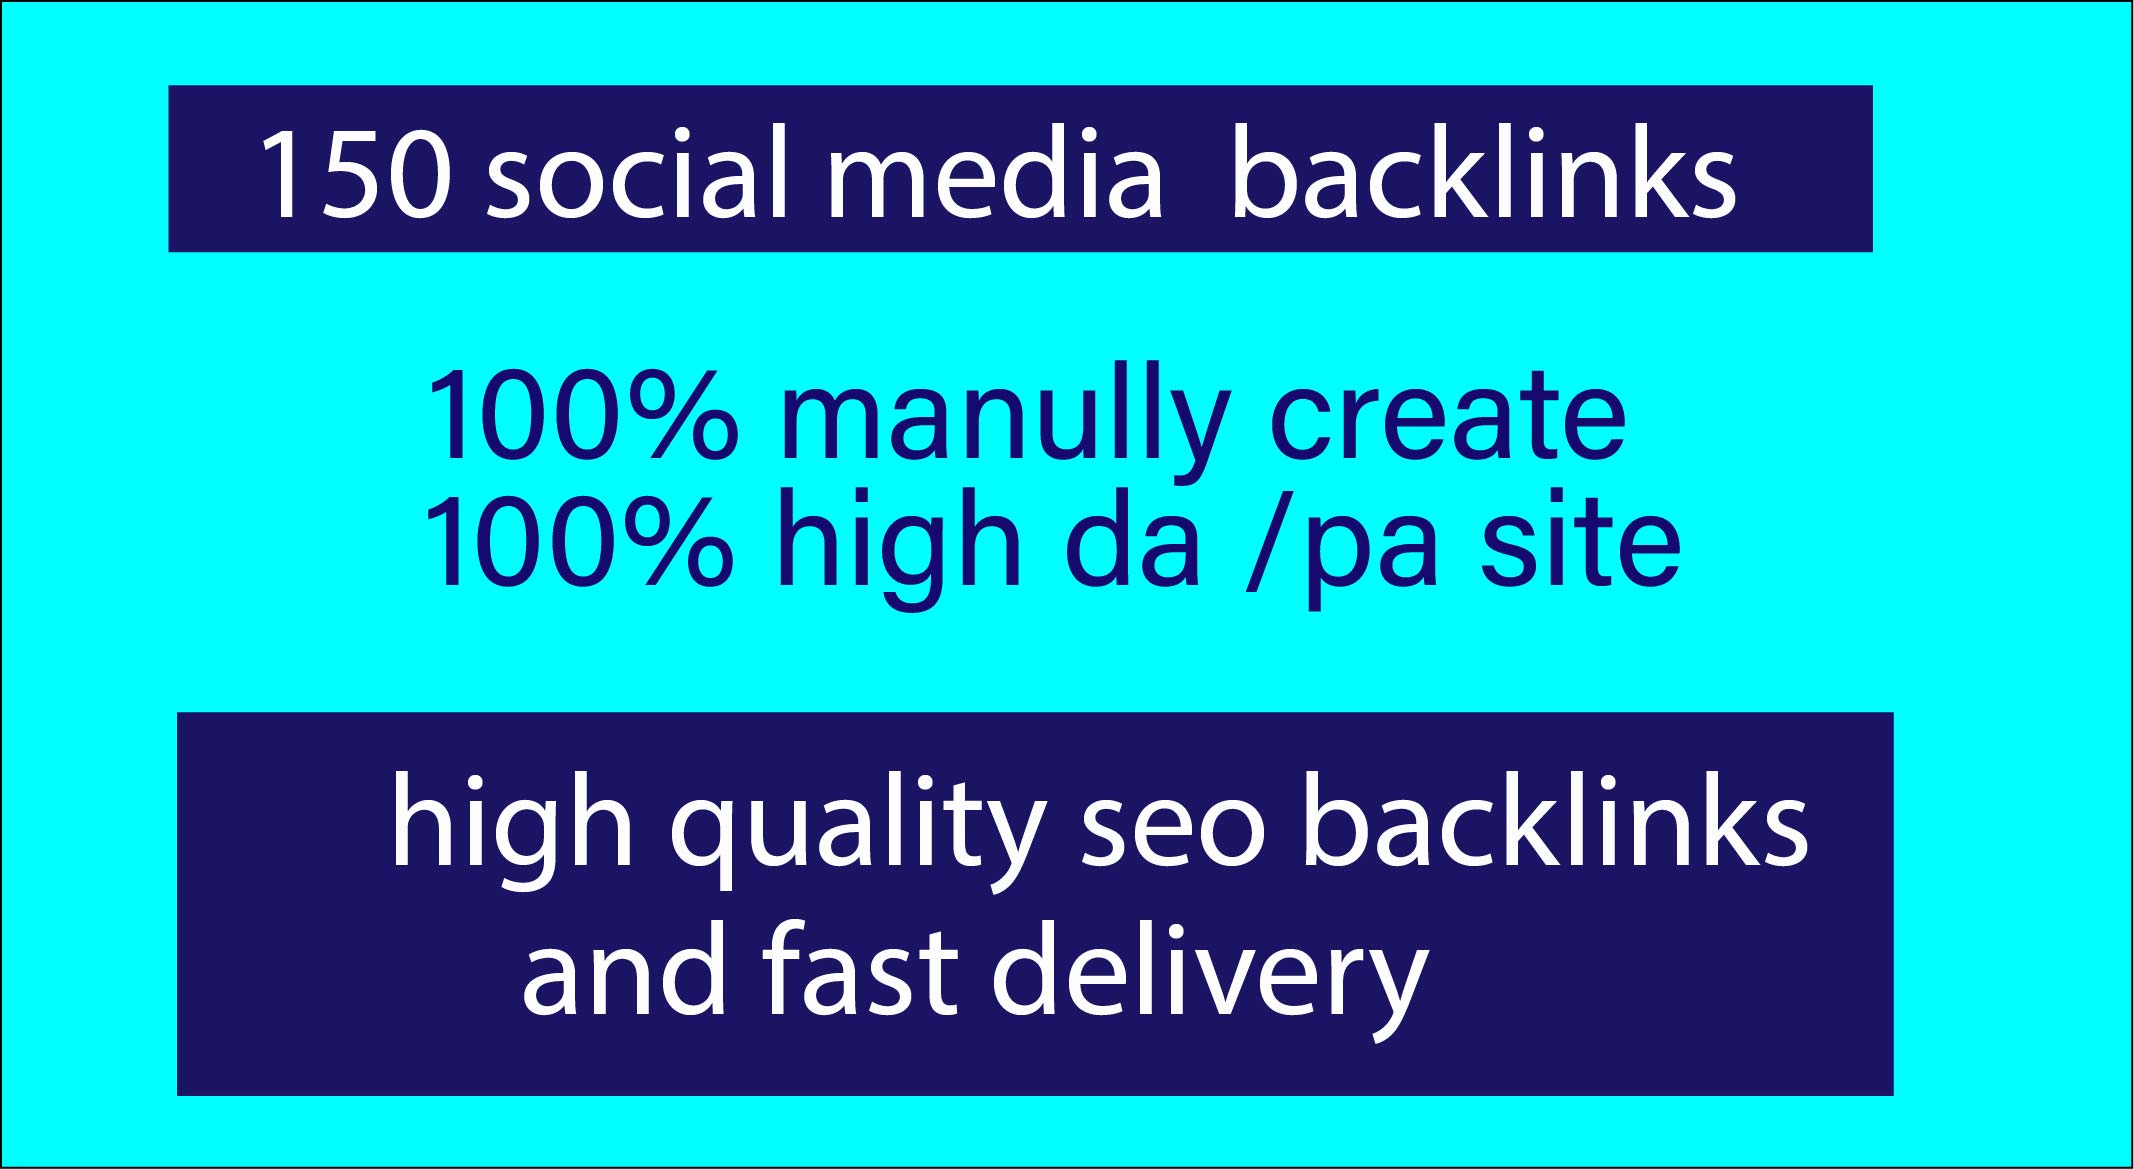 150 social media bookmark backlinks for SEO